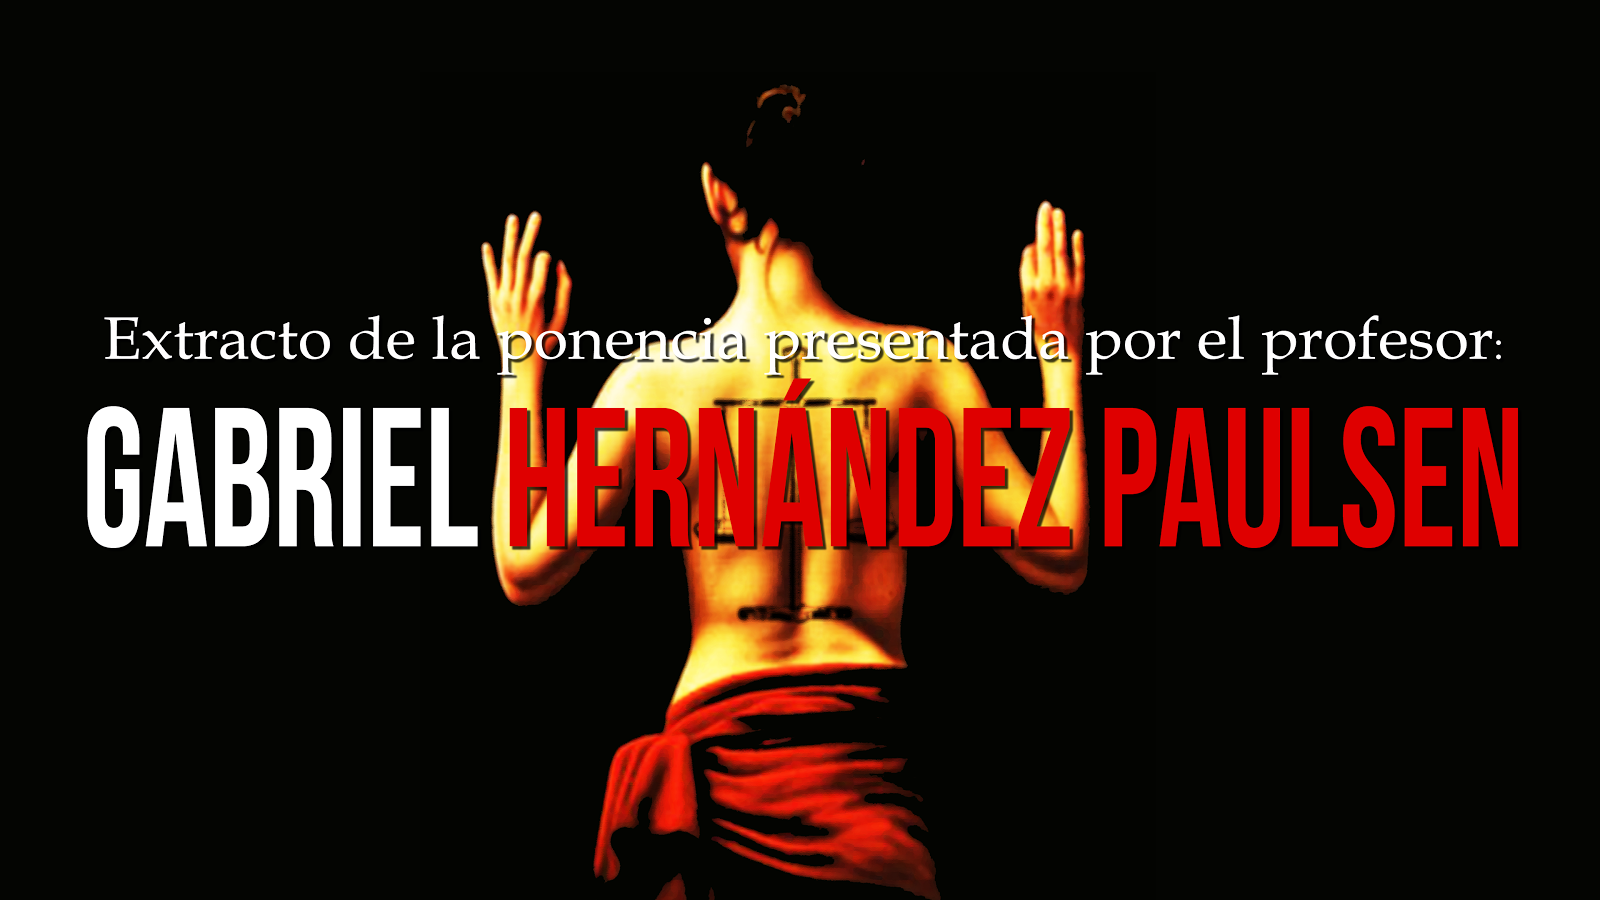 Gabriel Hernández Paulsen